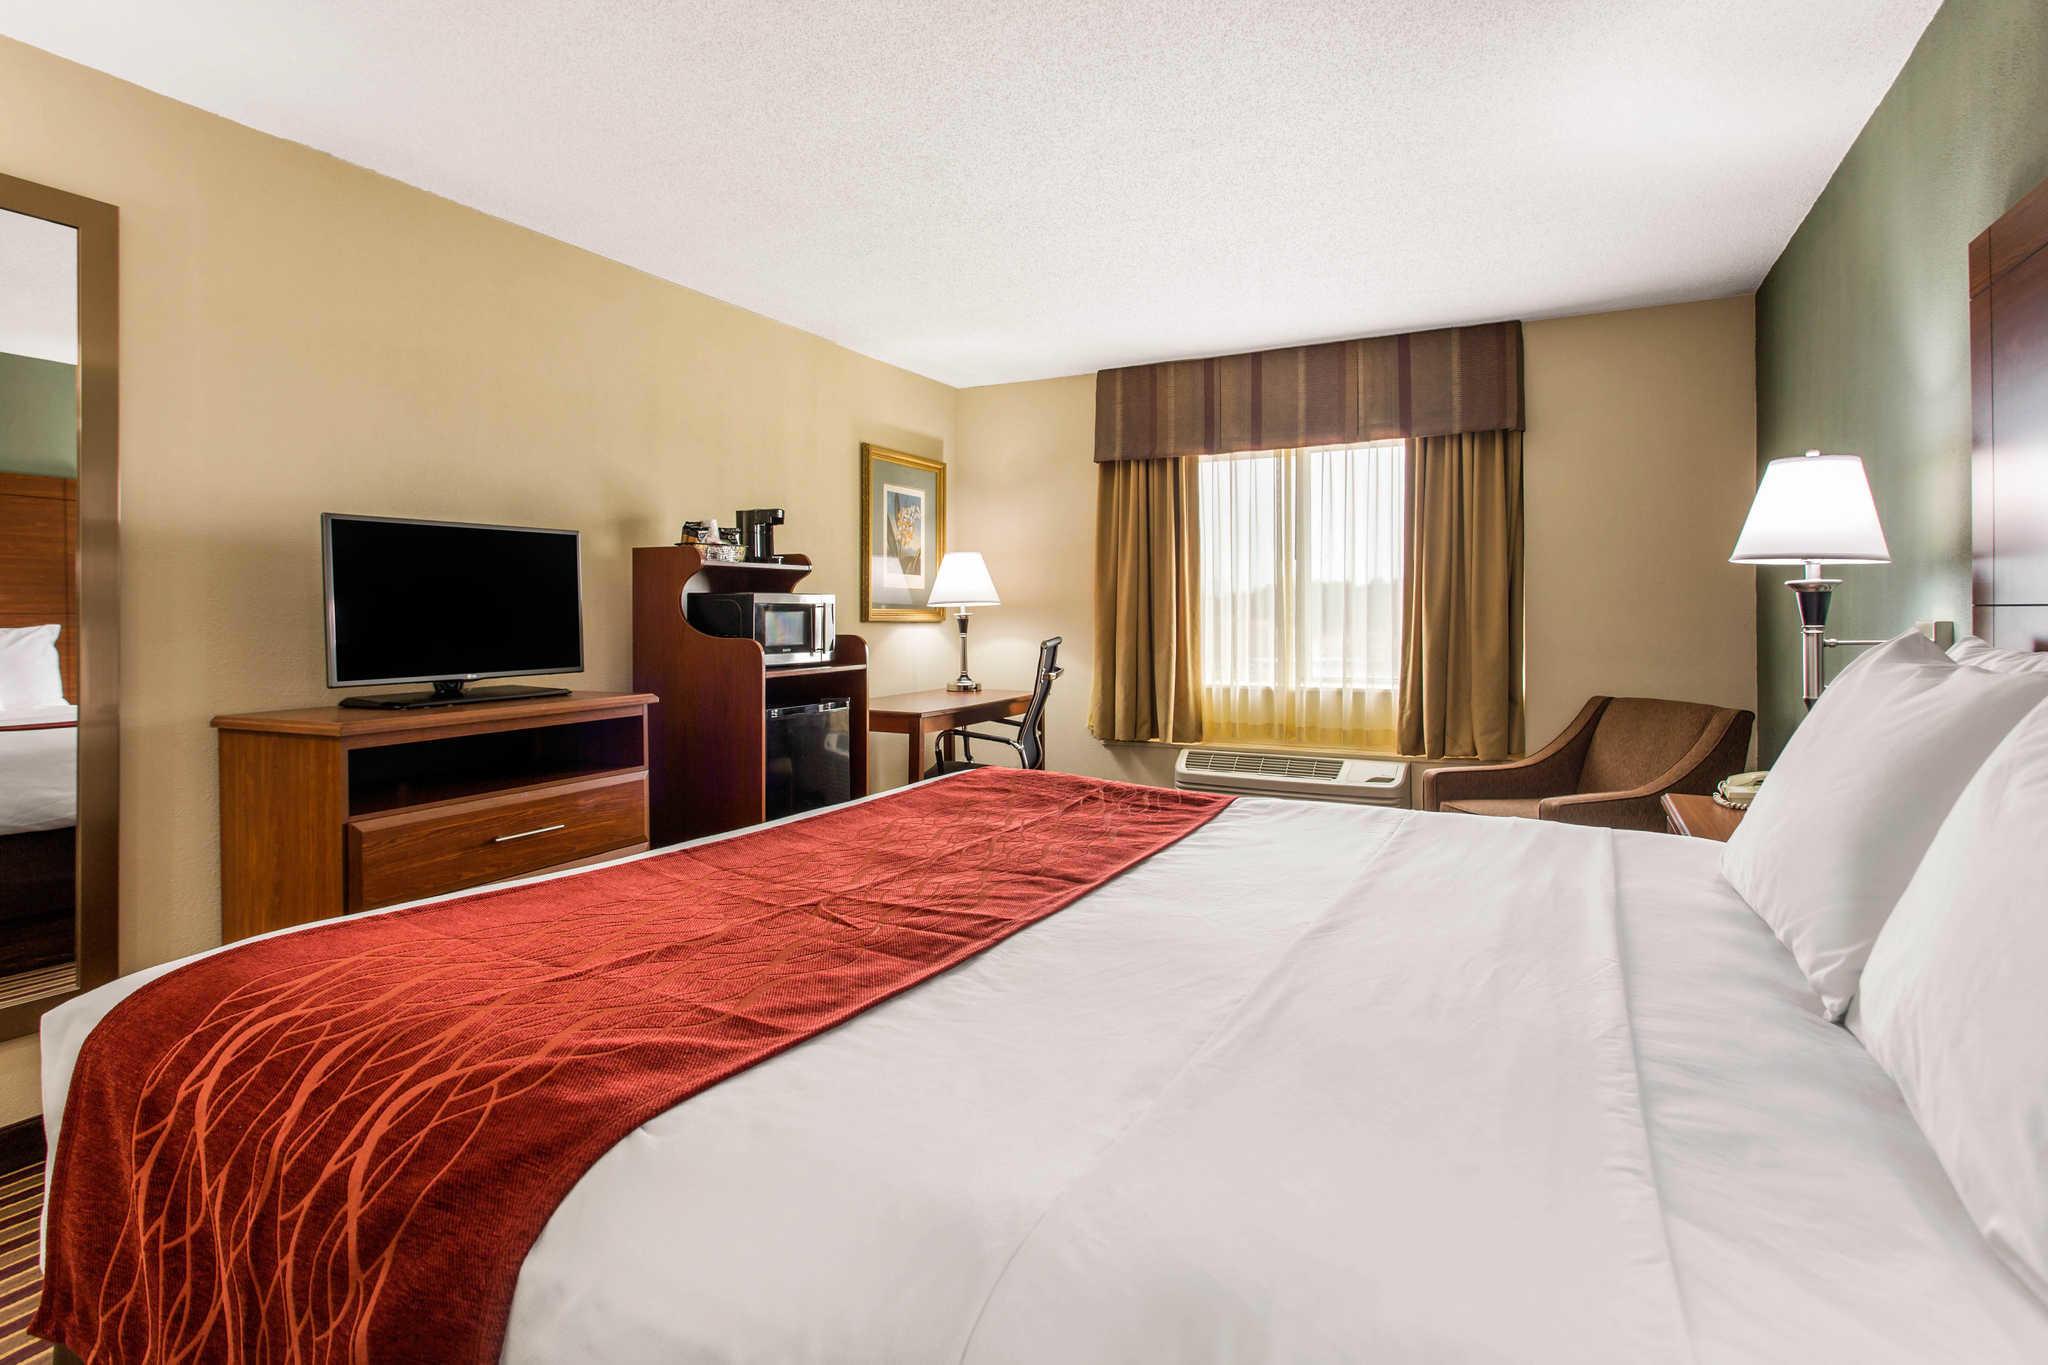 Comfort Inn & Suites Crabtree Valley image 9